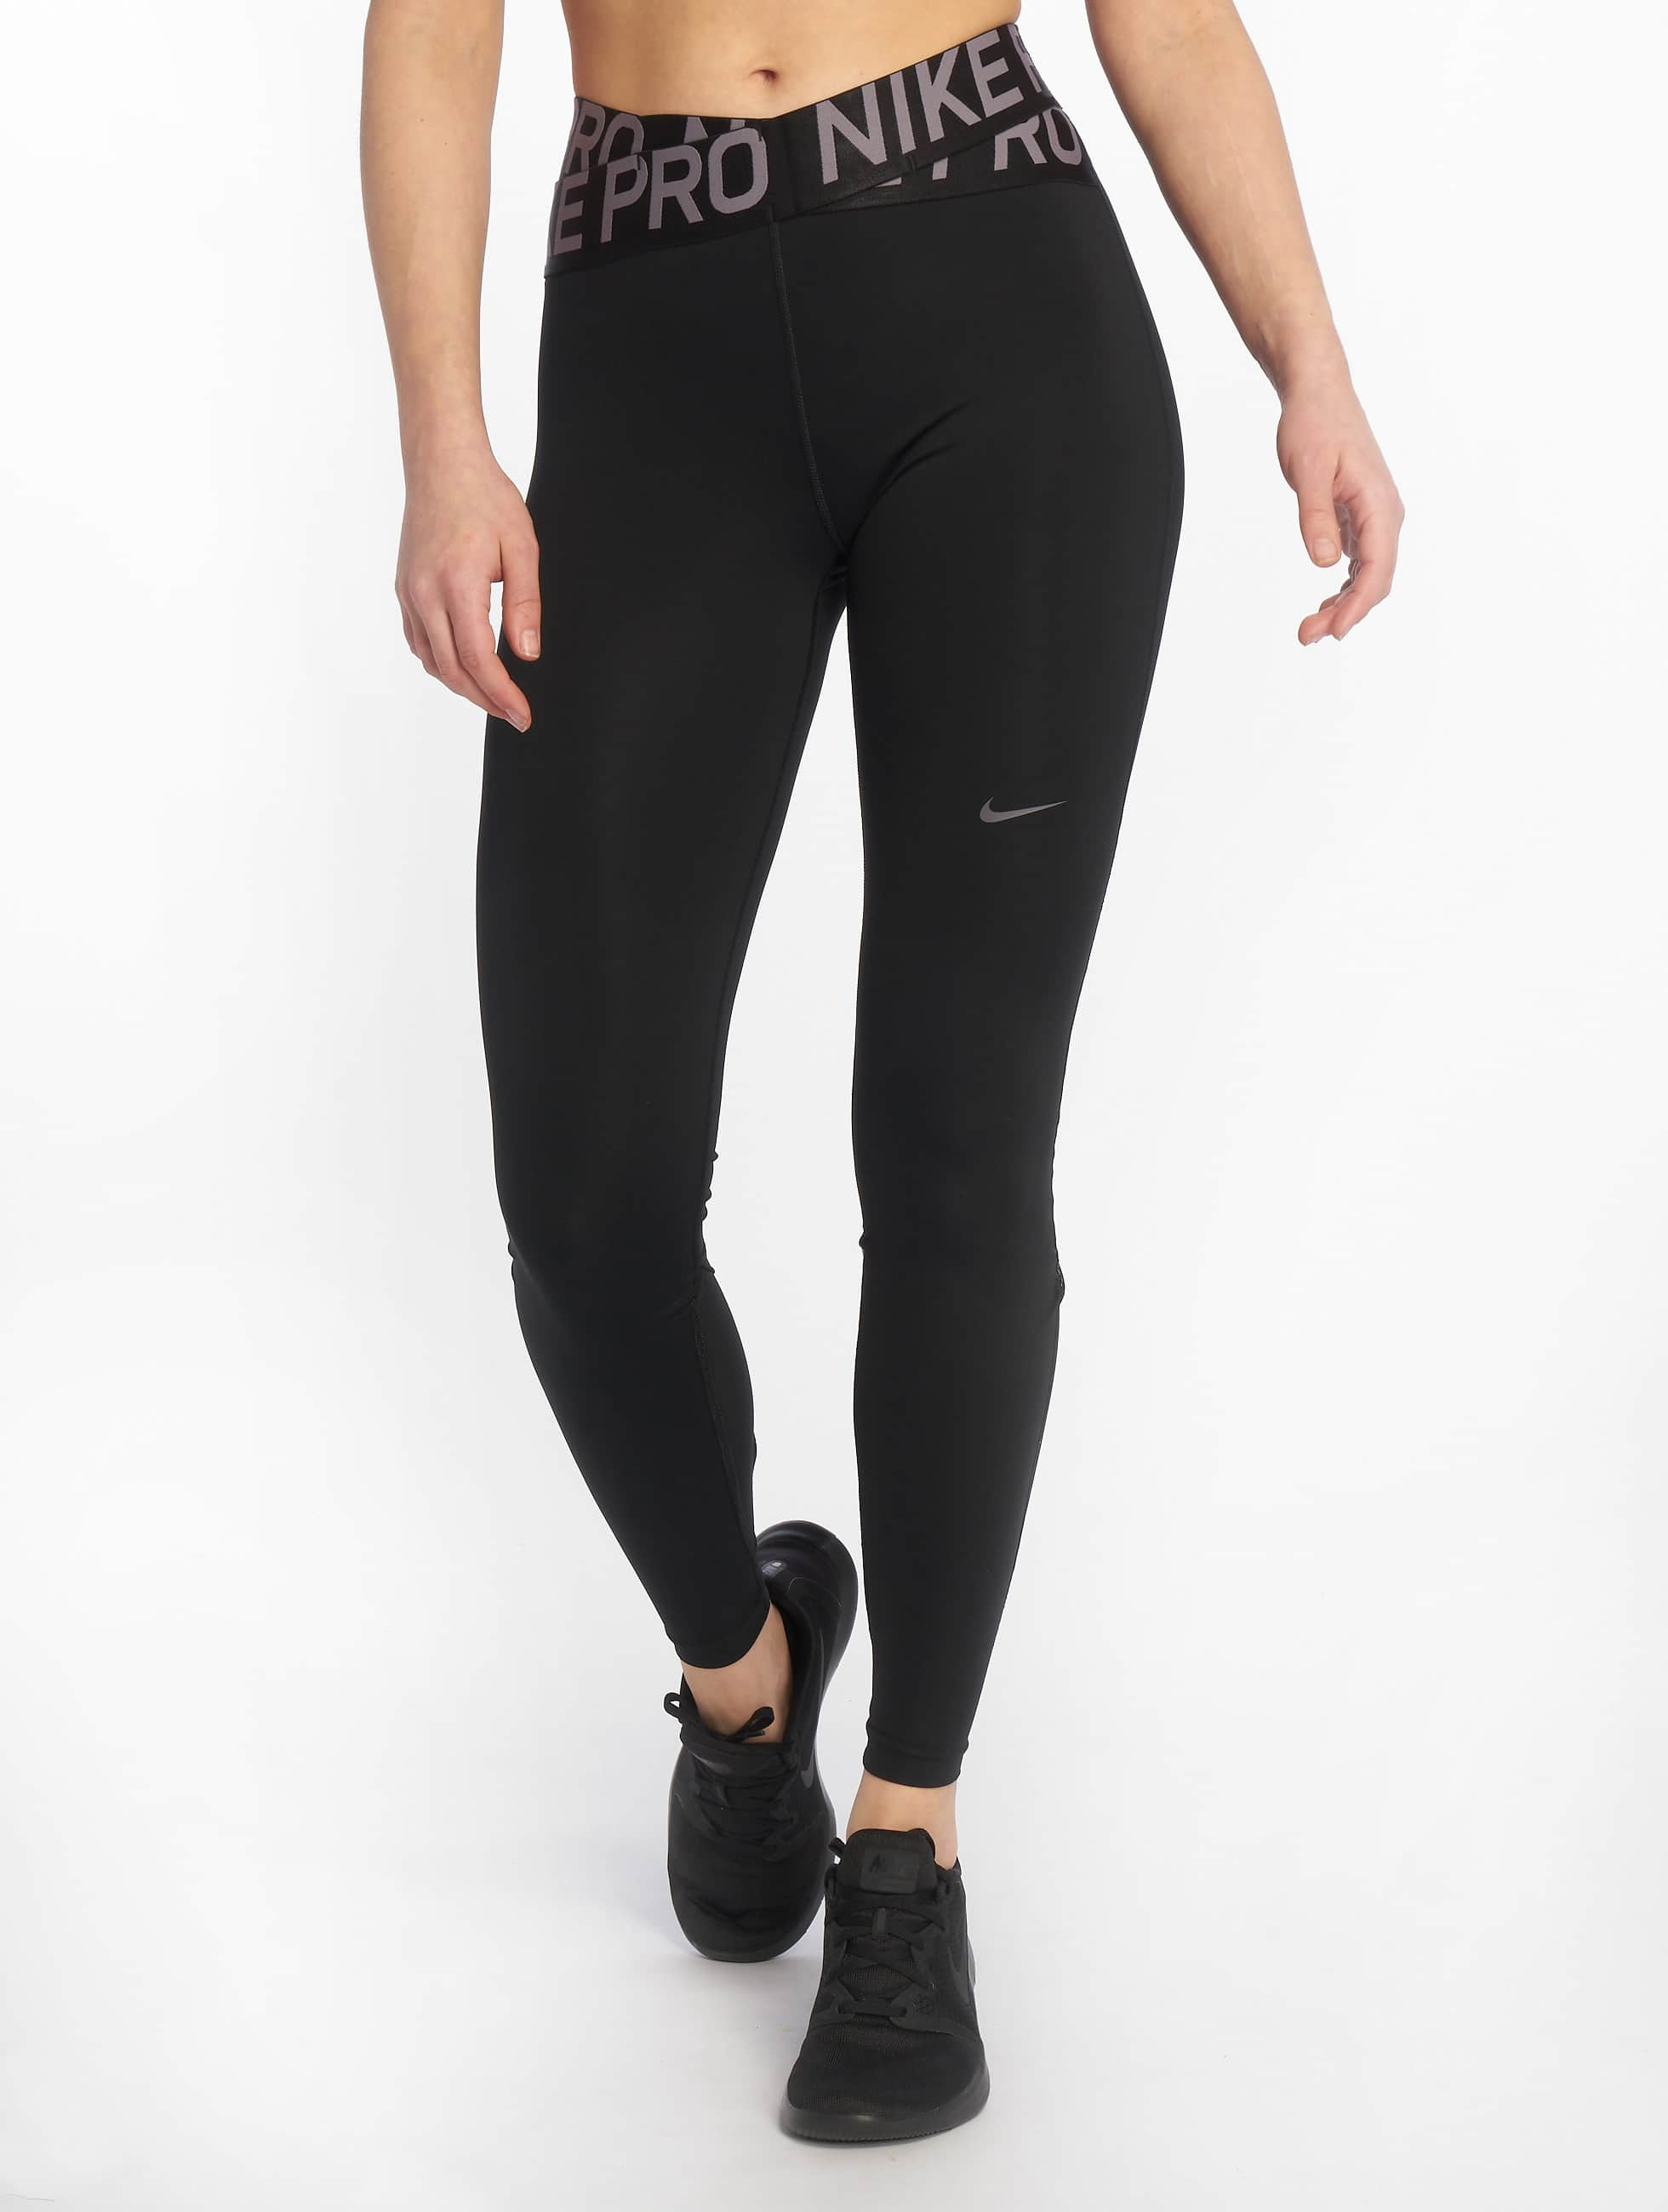 Nike Pro Intertwist 2.0 Tight Leggings Black/Thunder Grey